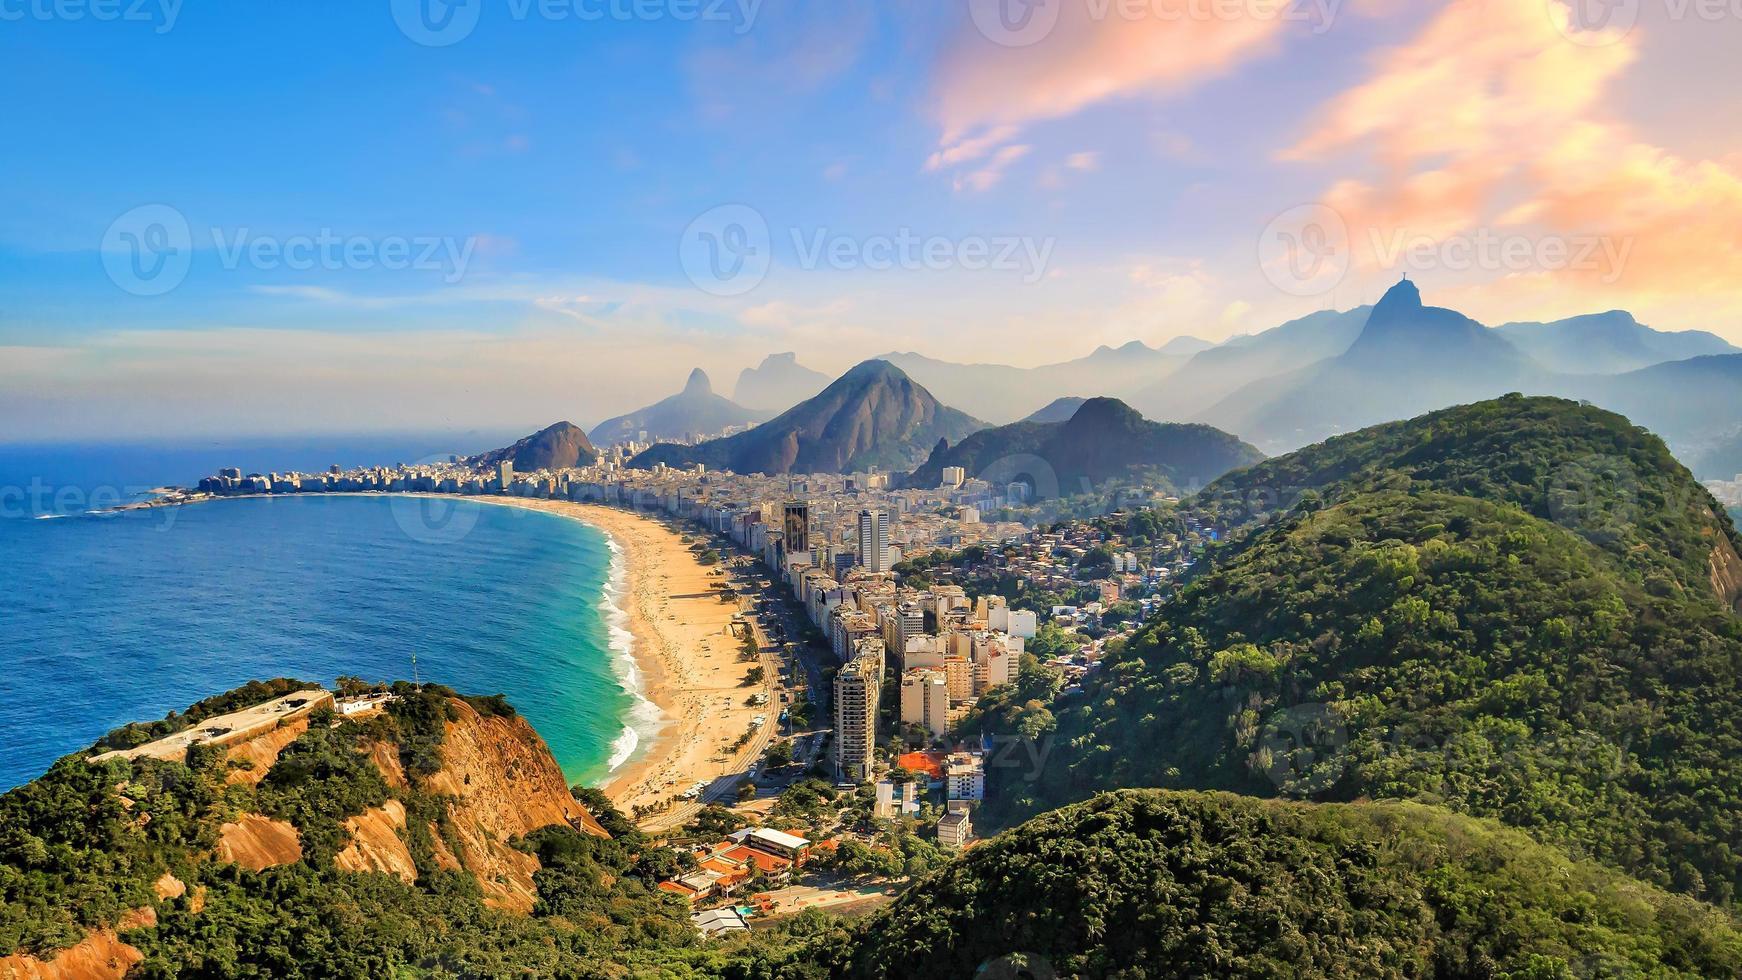 spiaggia di copacabana e spiaggia di ipanema a rio de janeiro, brasile foto